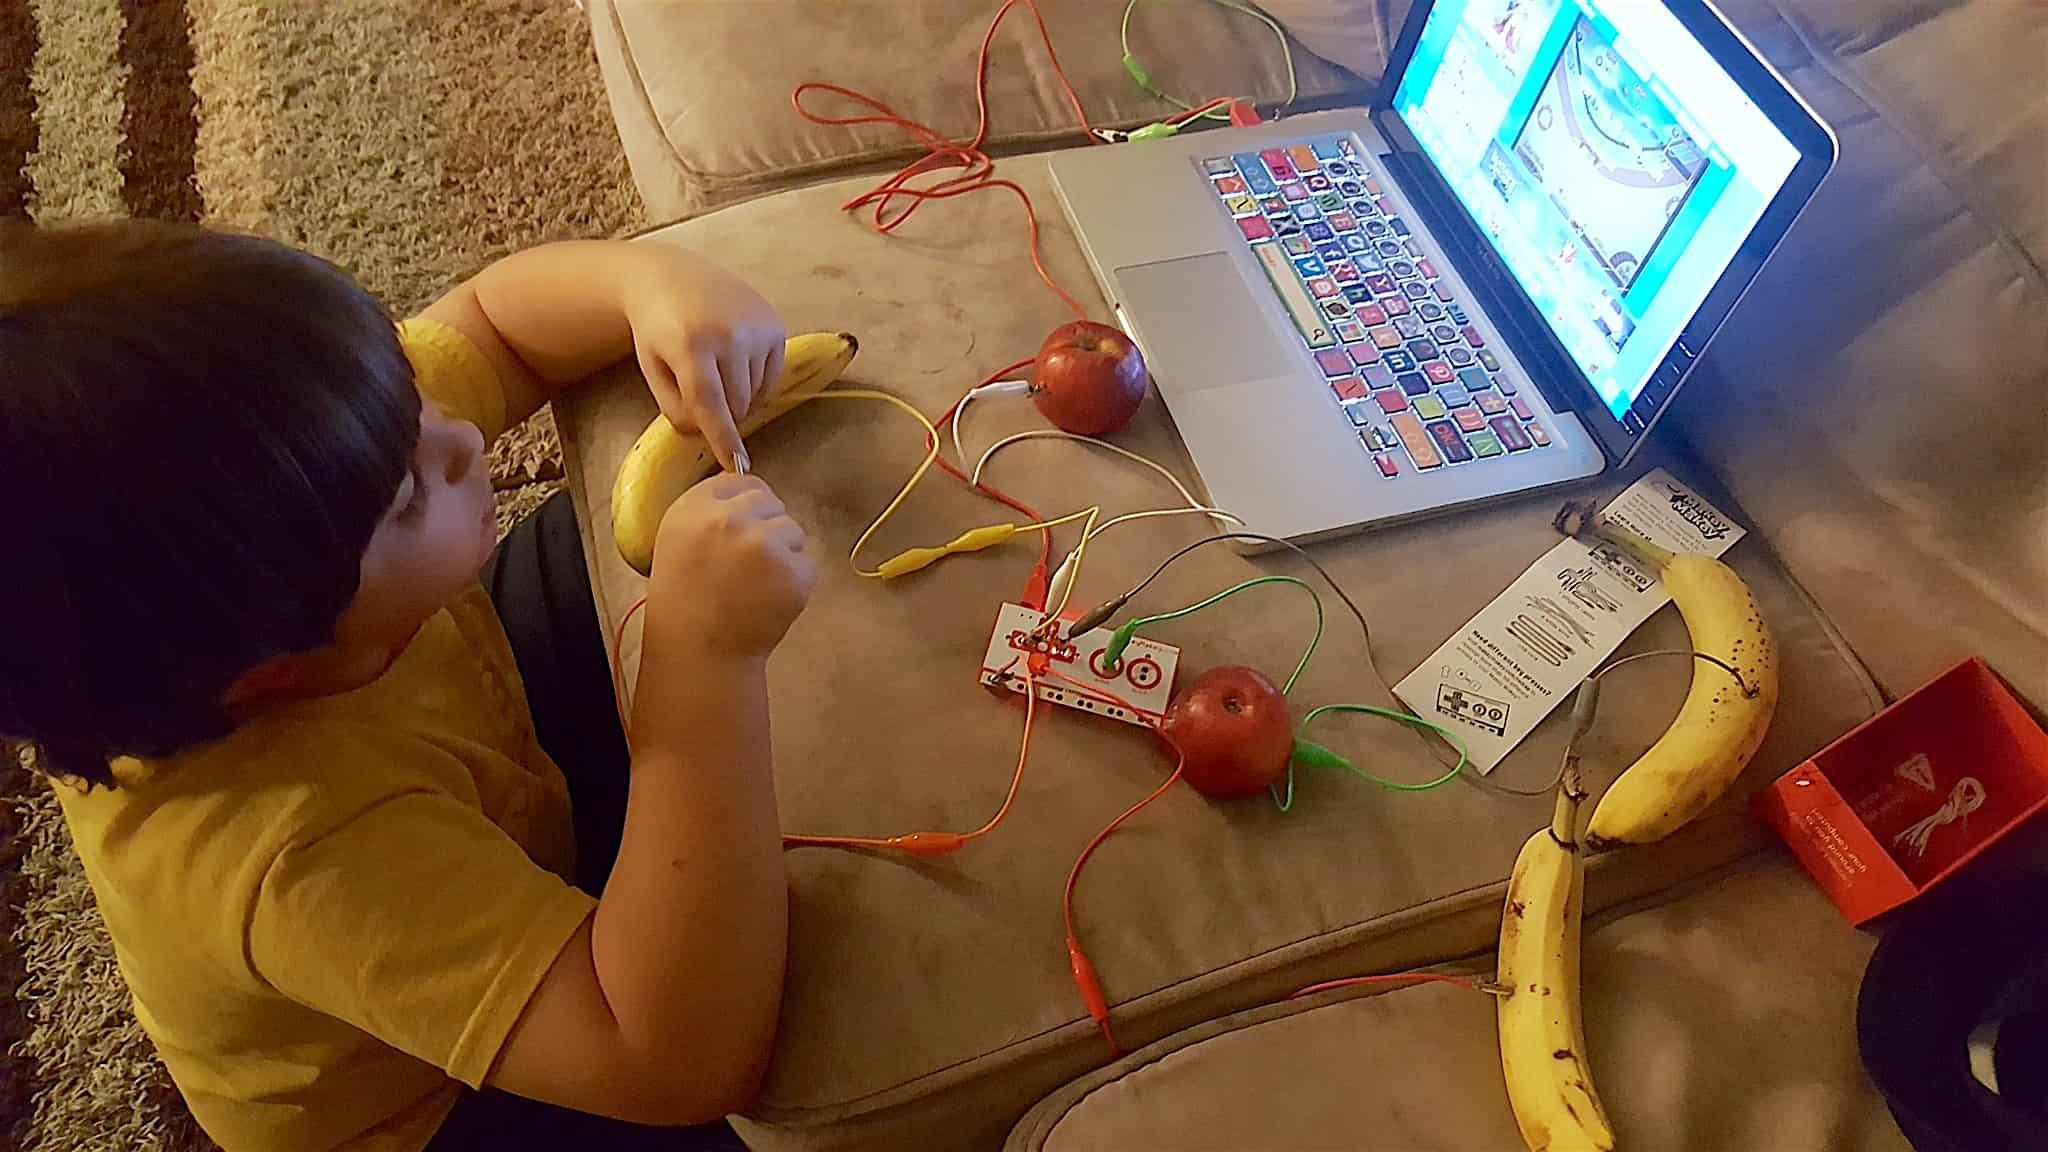 Makey Makey STEM Kid's Engineering Kit Review